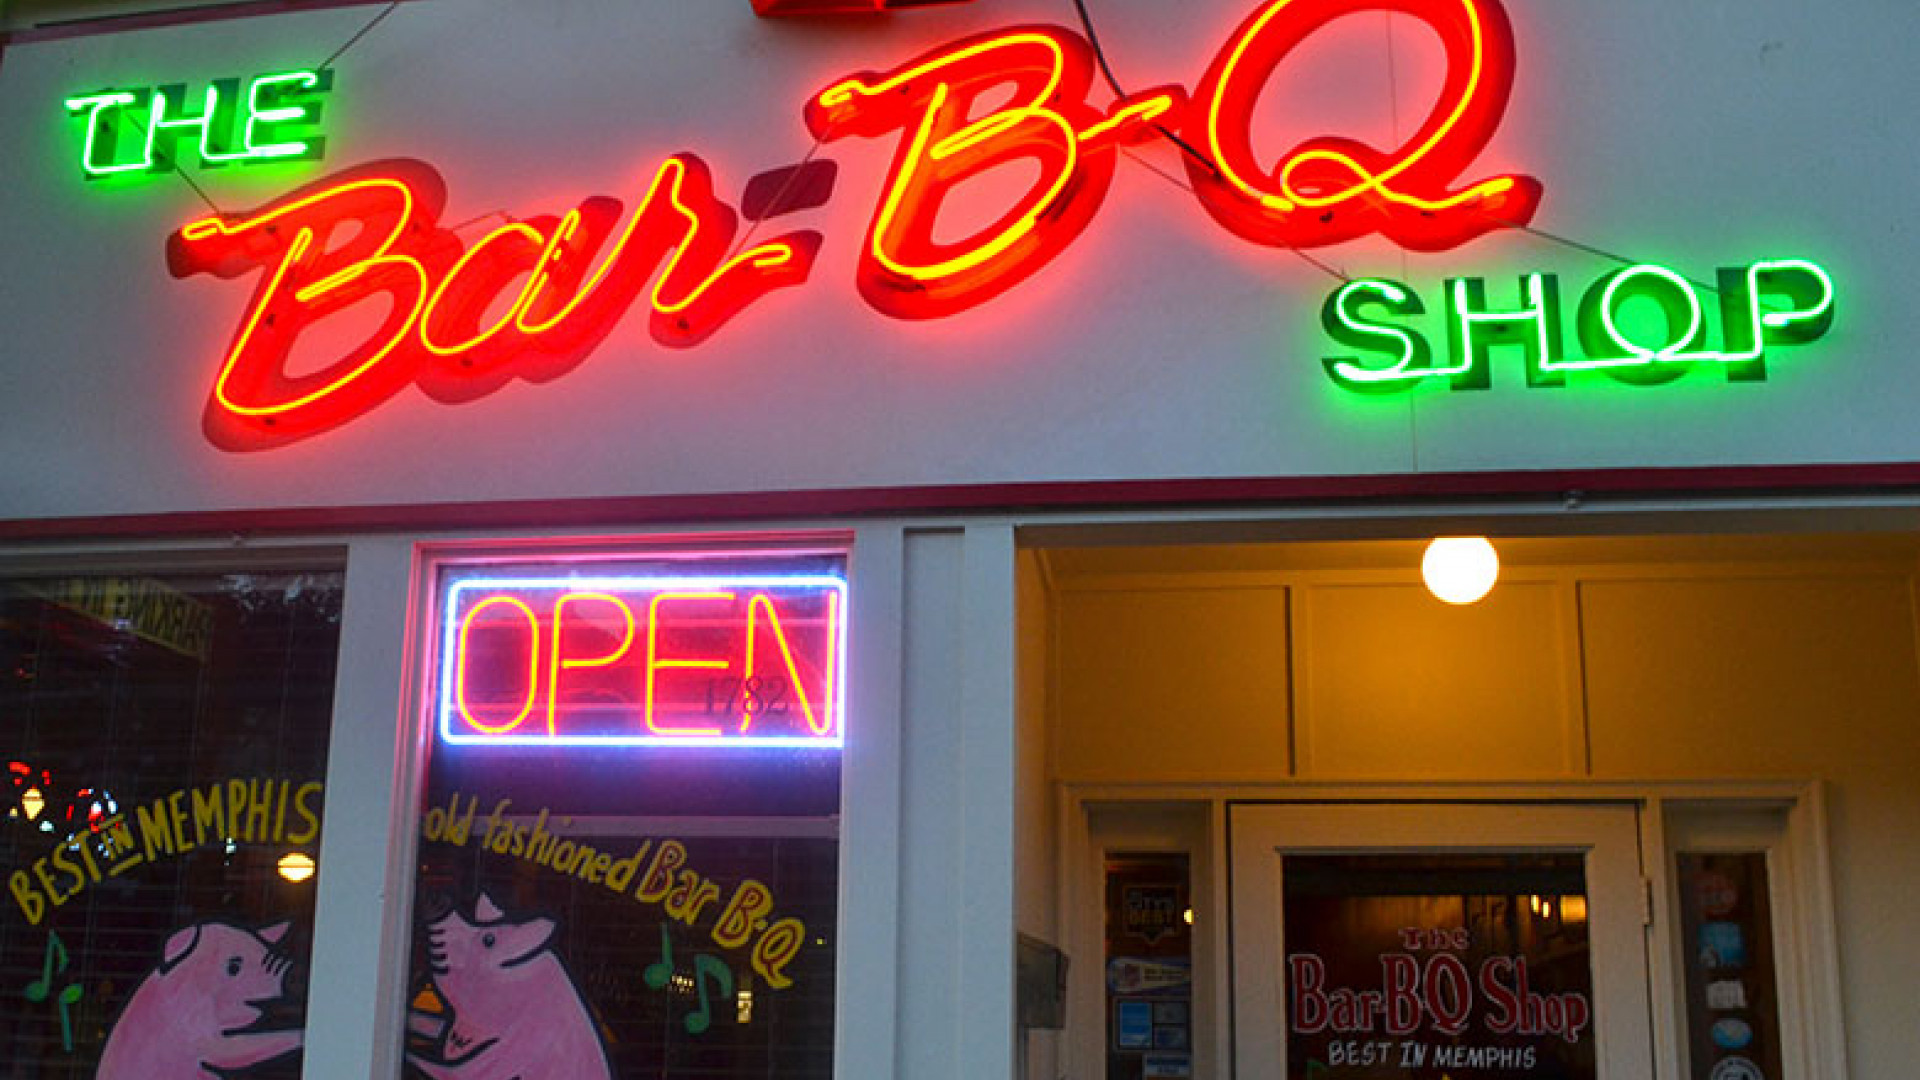 Bar-B-Q Shop